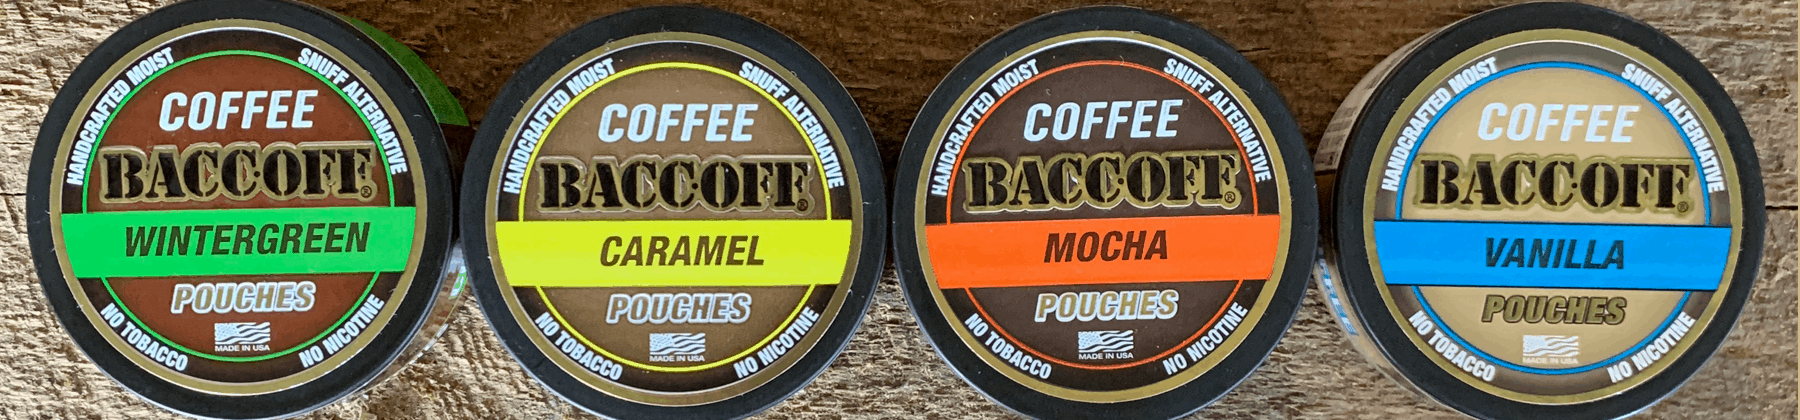 baccoff coffee dip